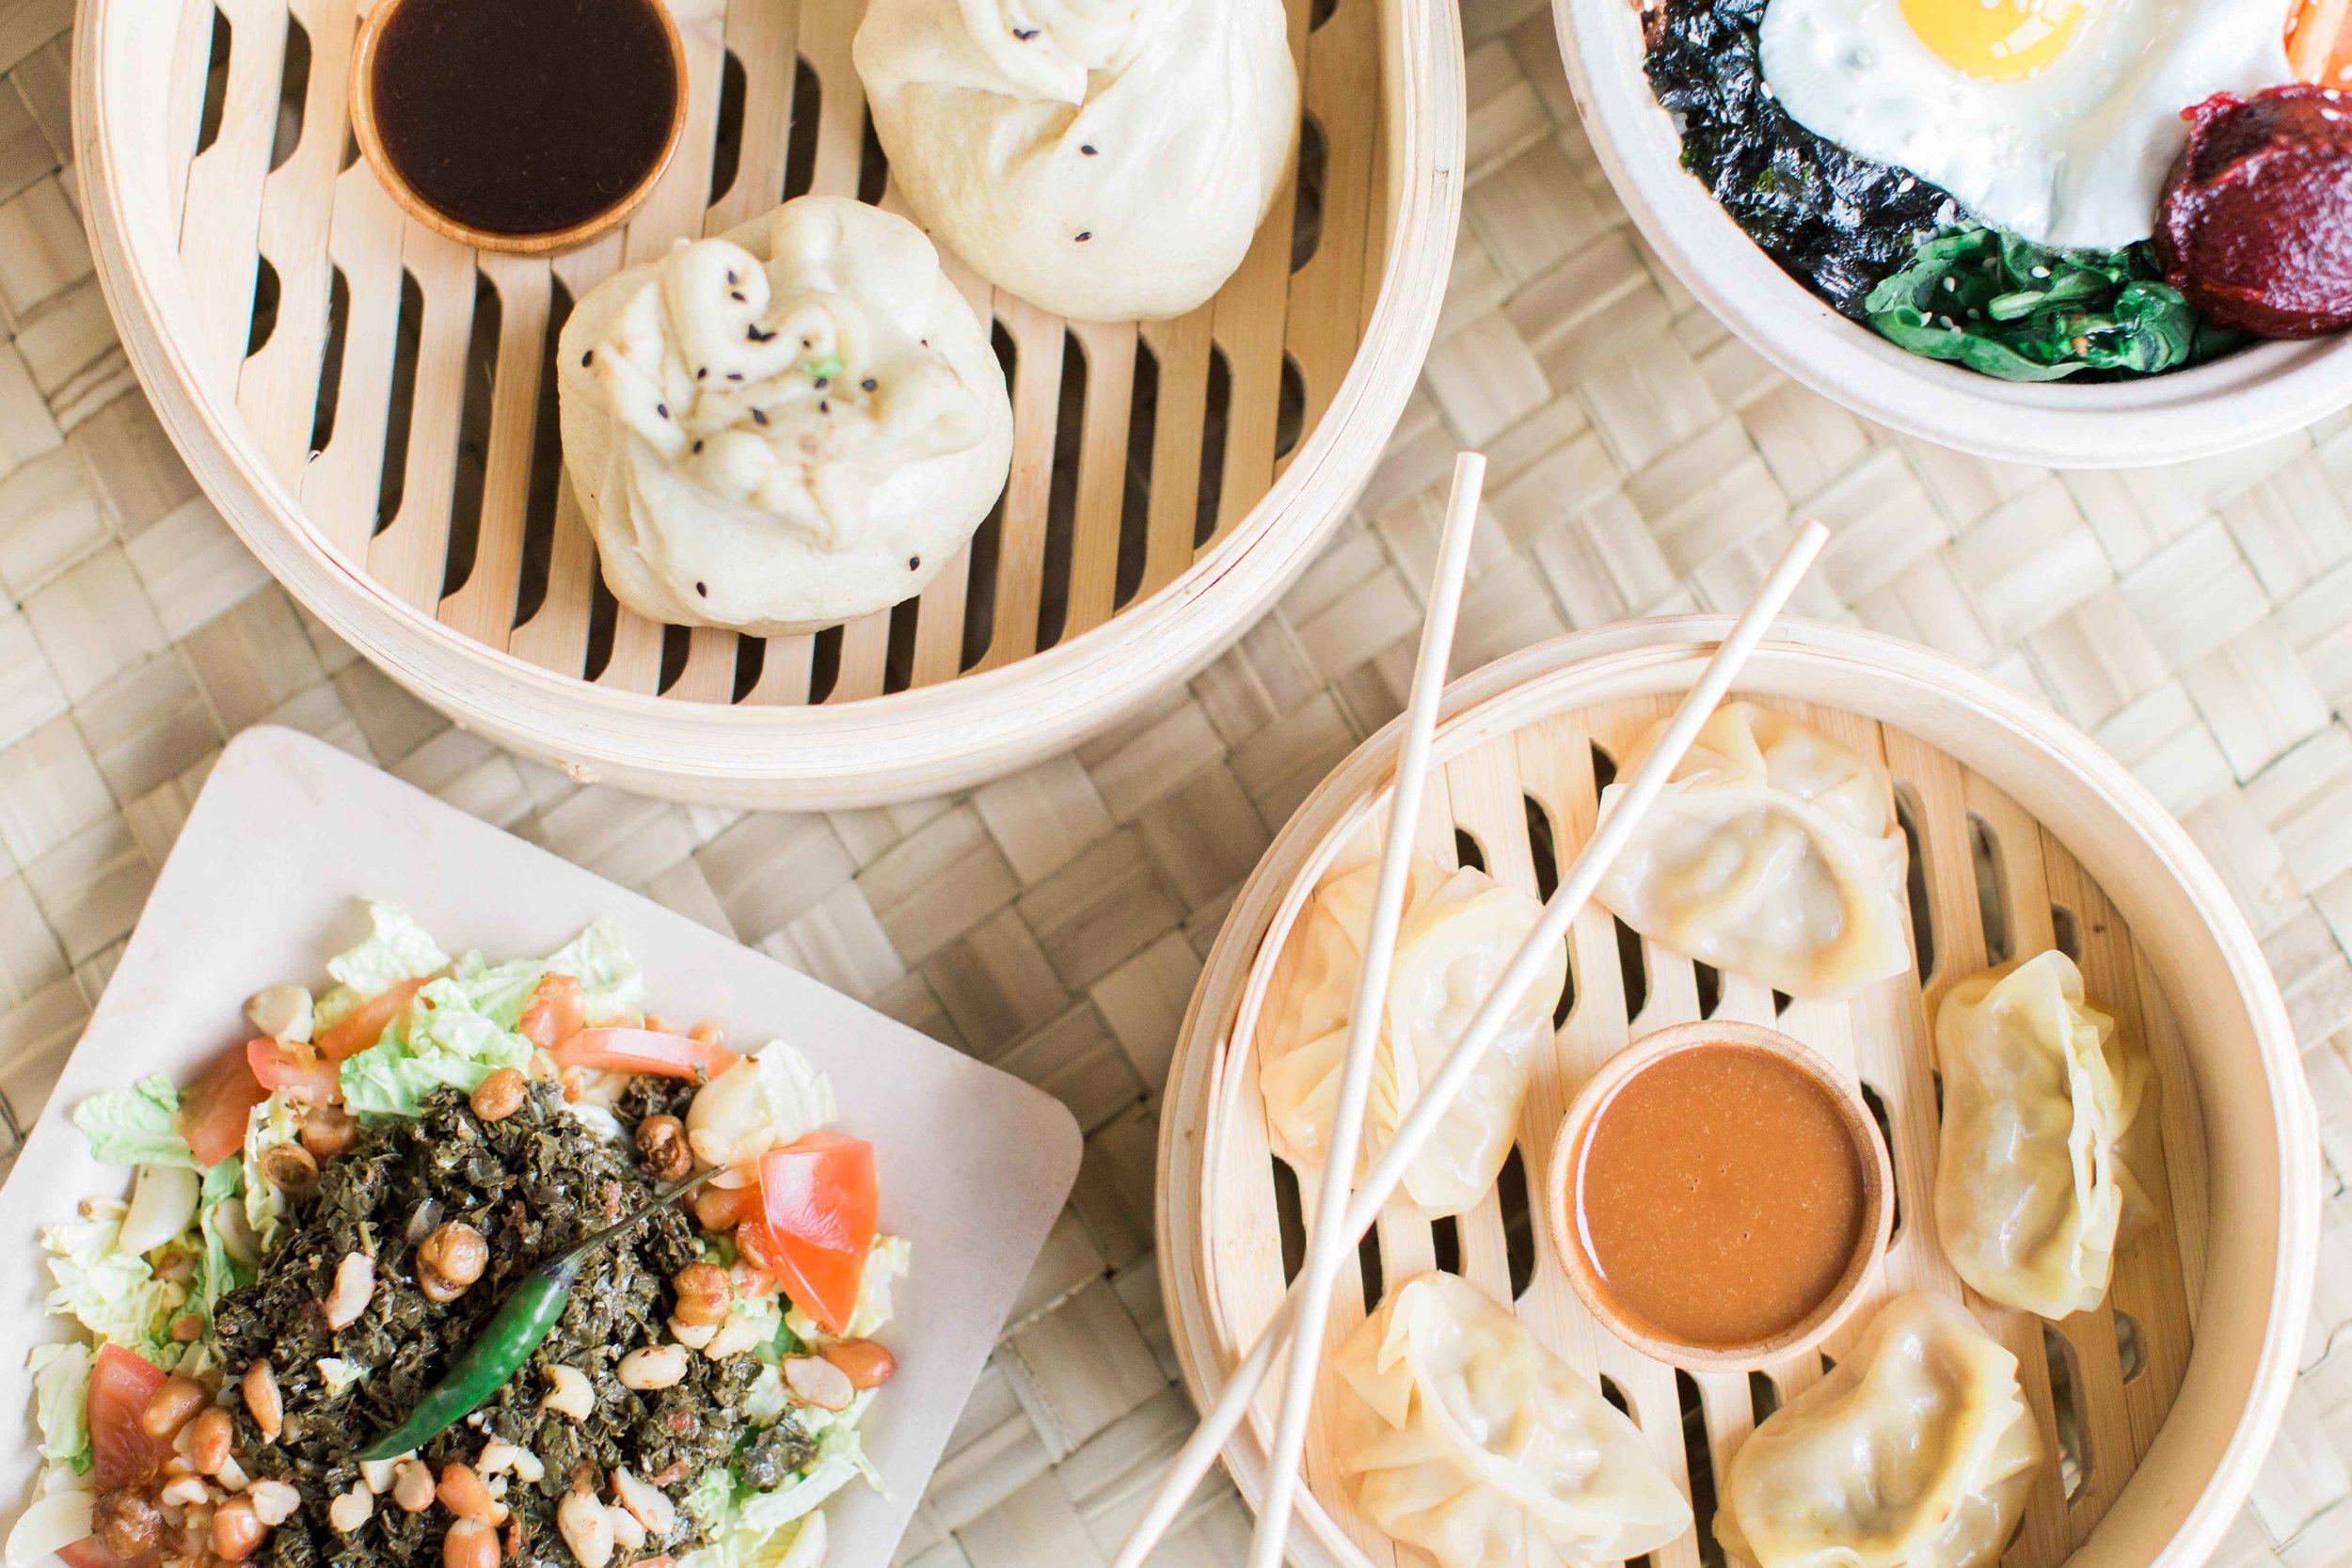 Dumpling-Darling-food-tray.jpg